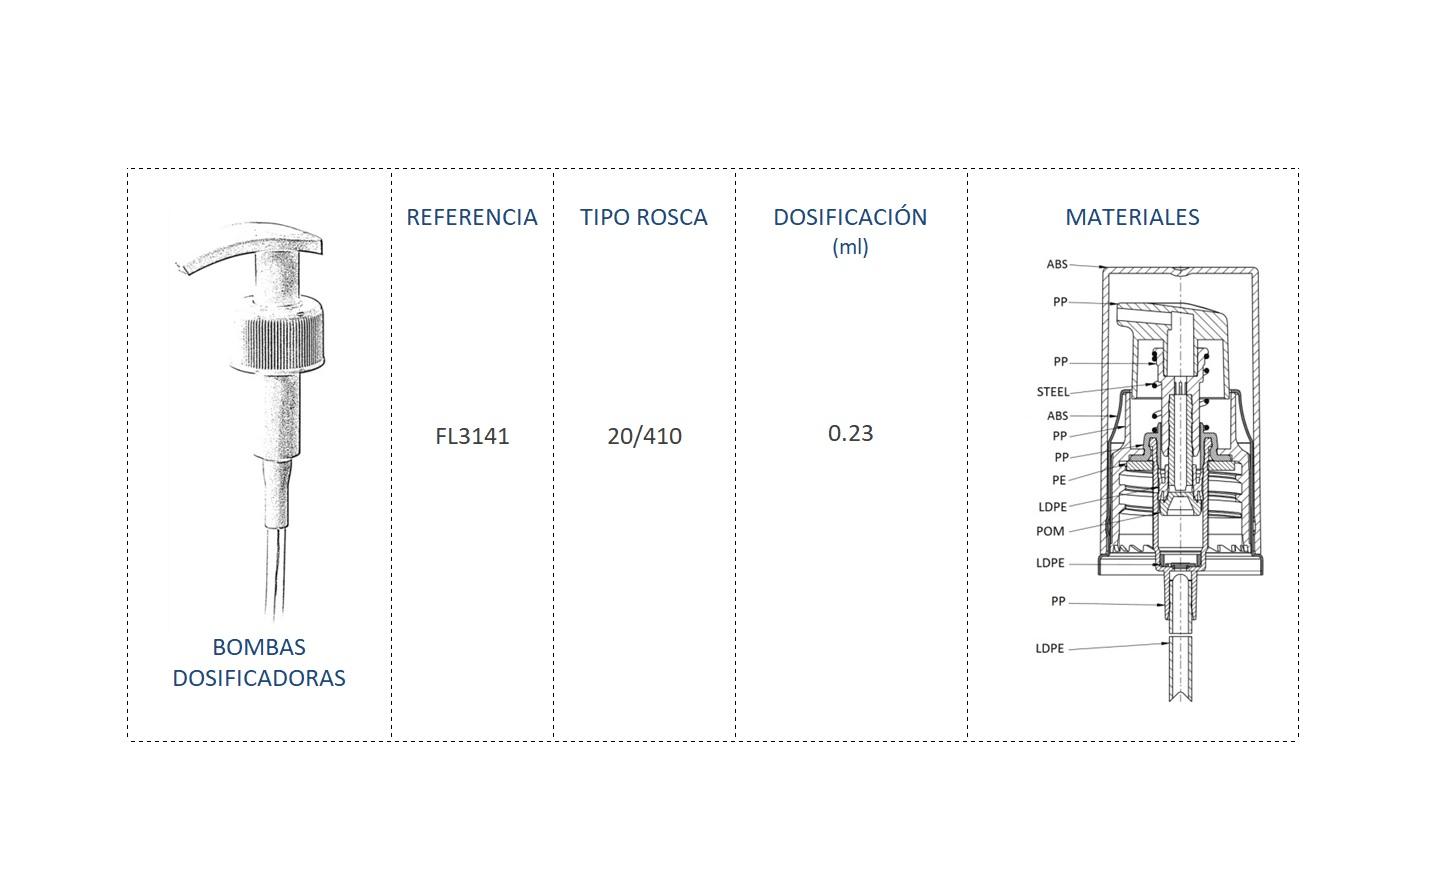 Cuadro de materiales bomba dosificadora FL3141 20/410